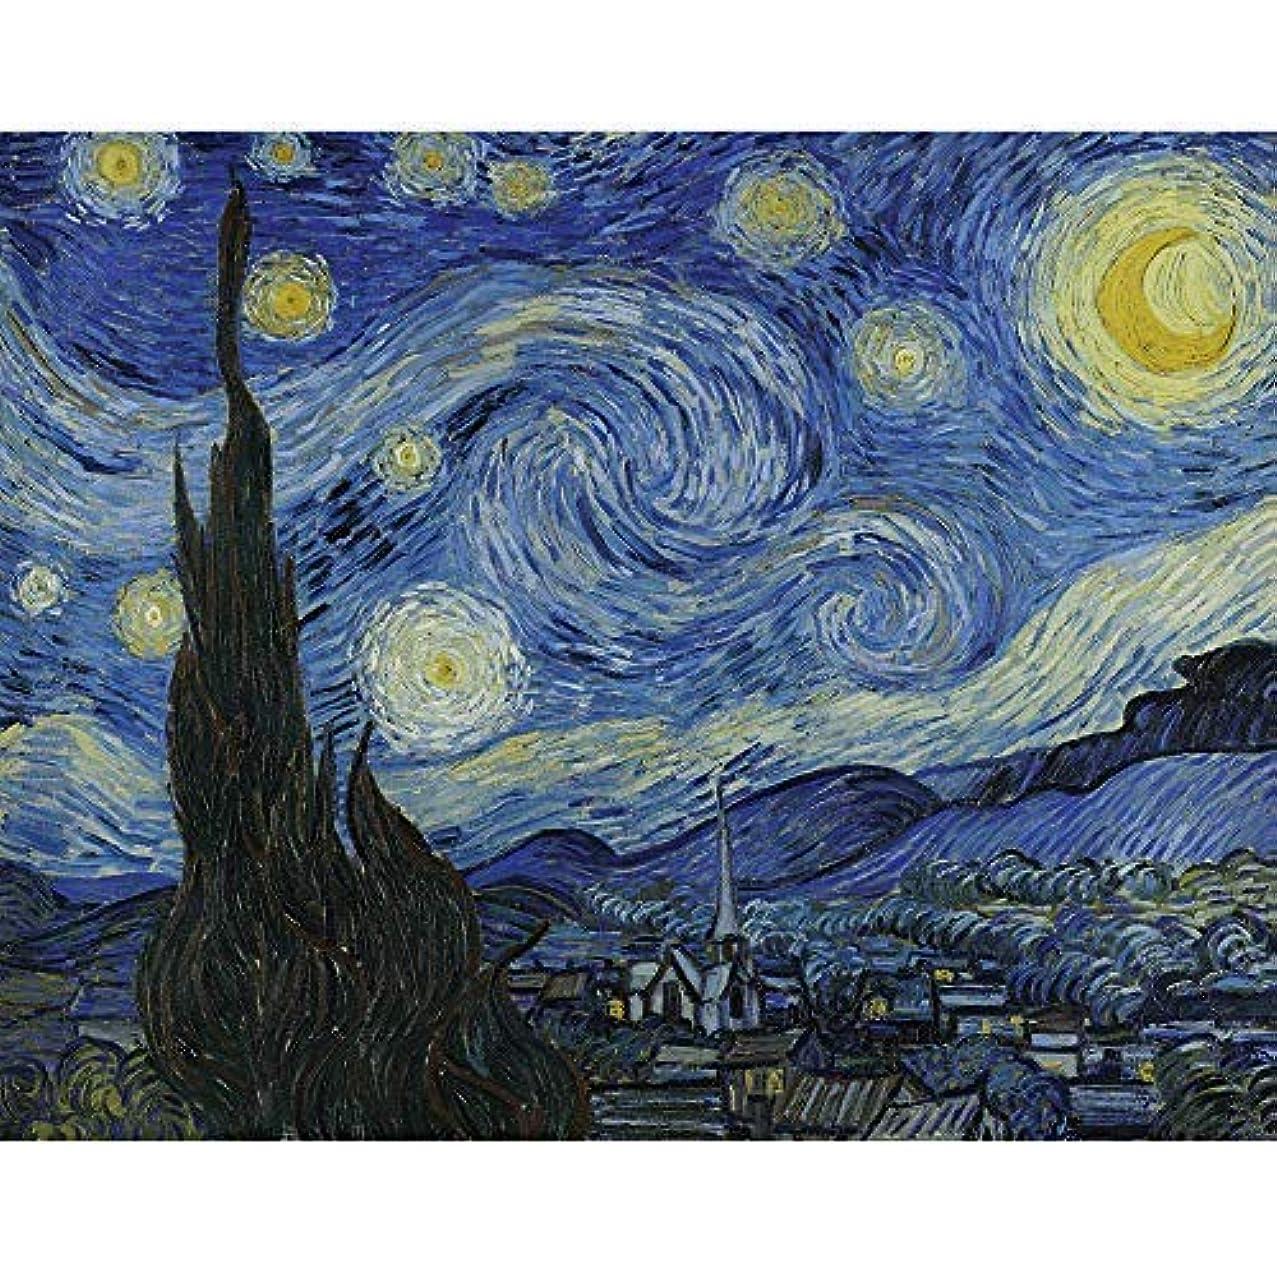 ROYAL BRUSH Starry Night Paint Set